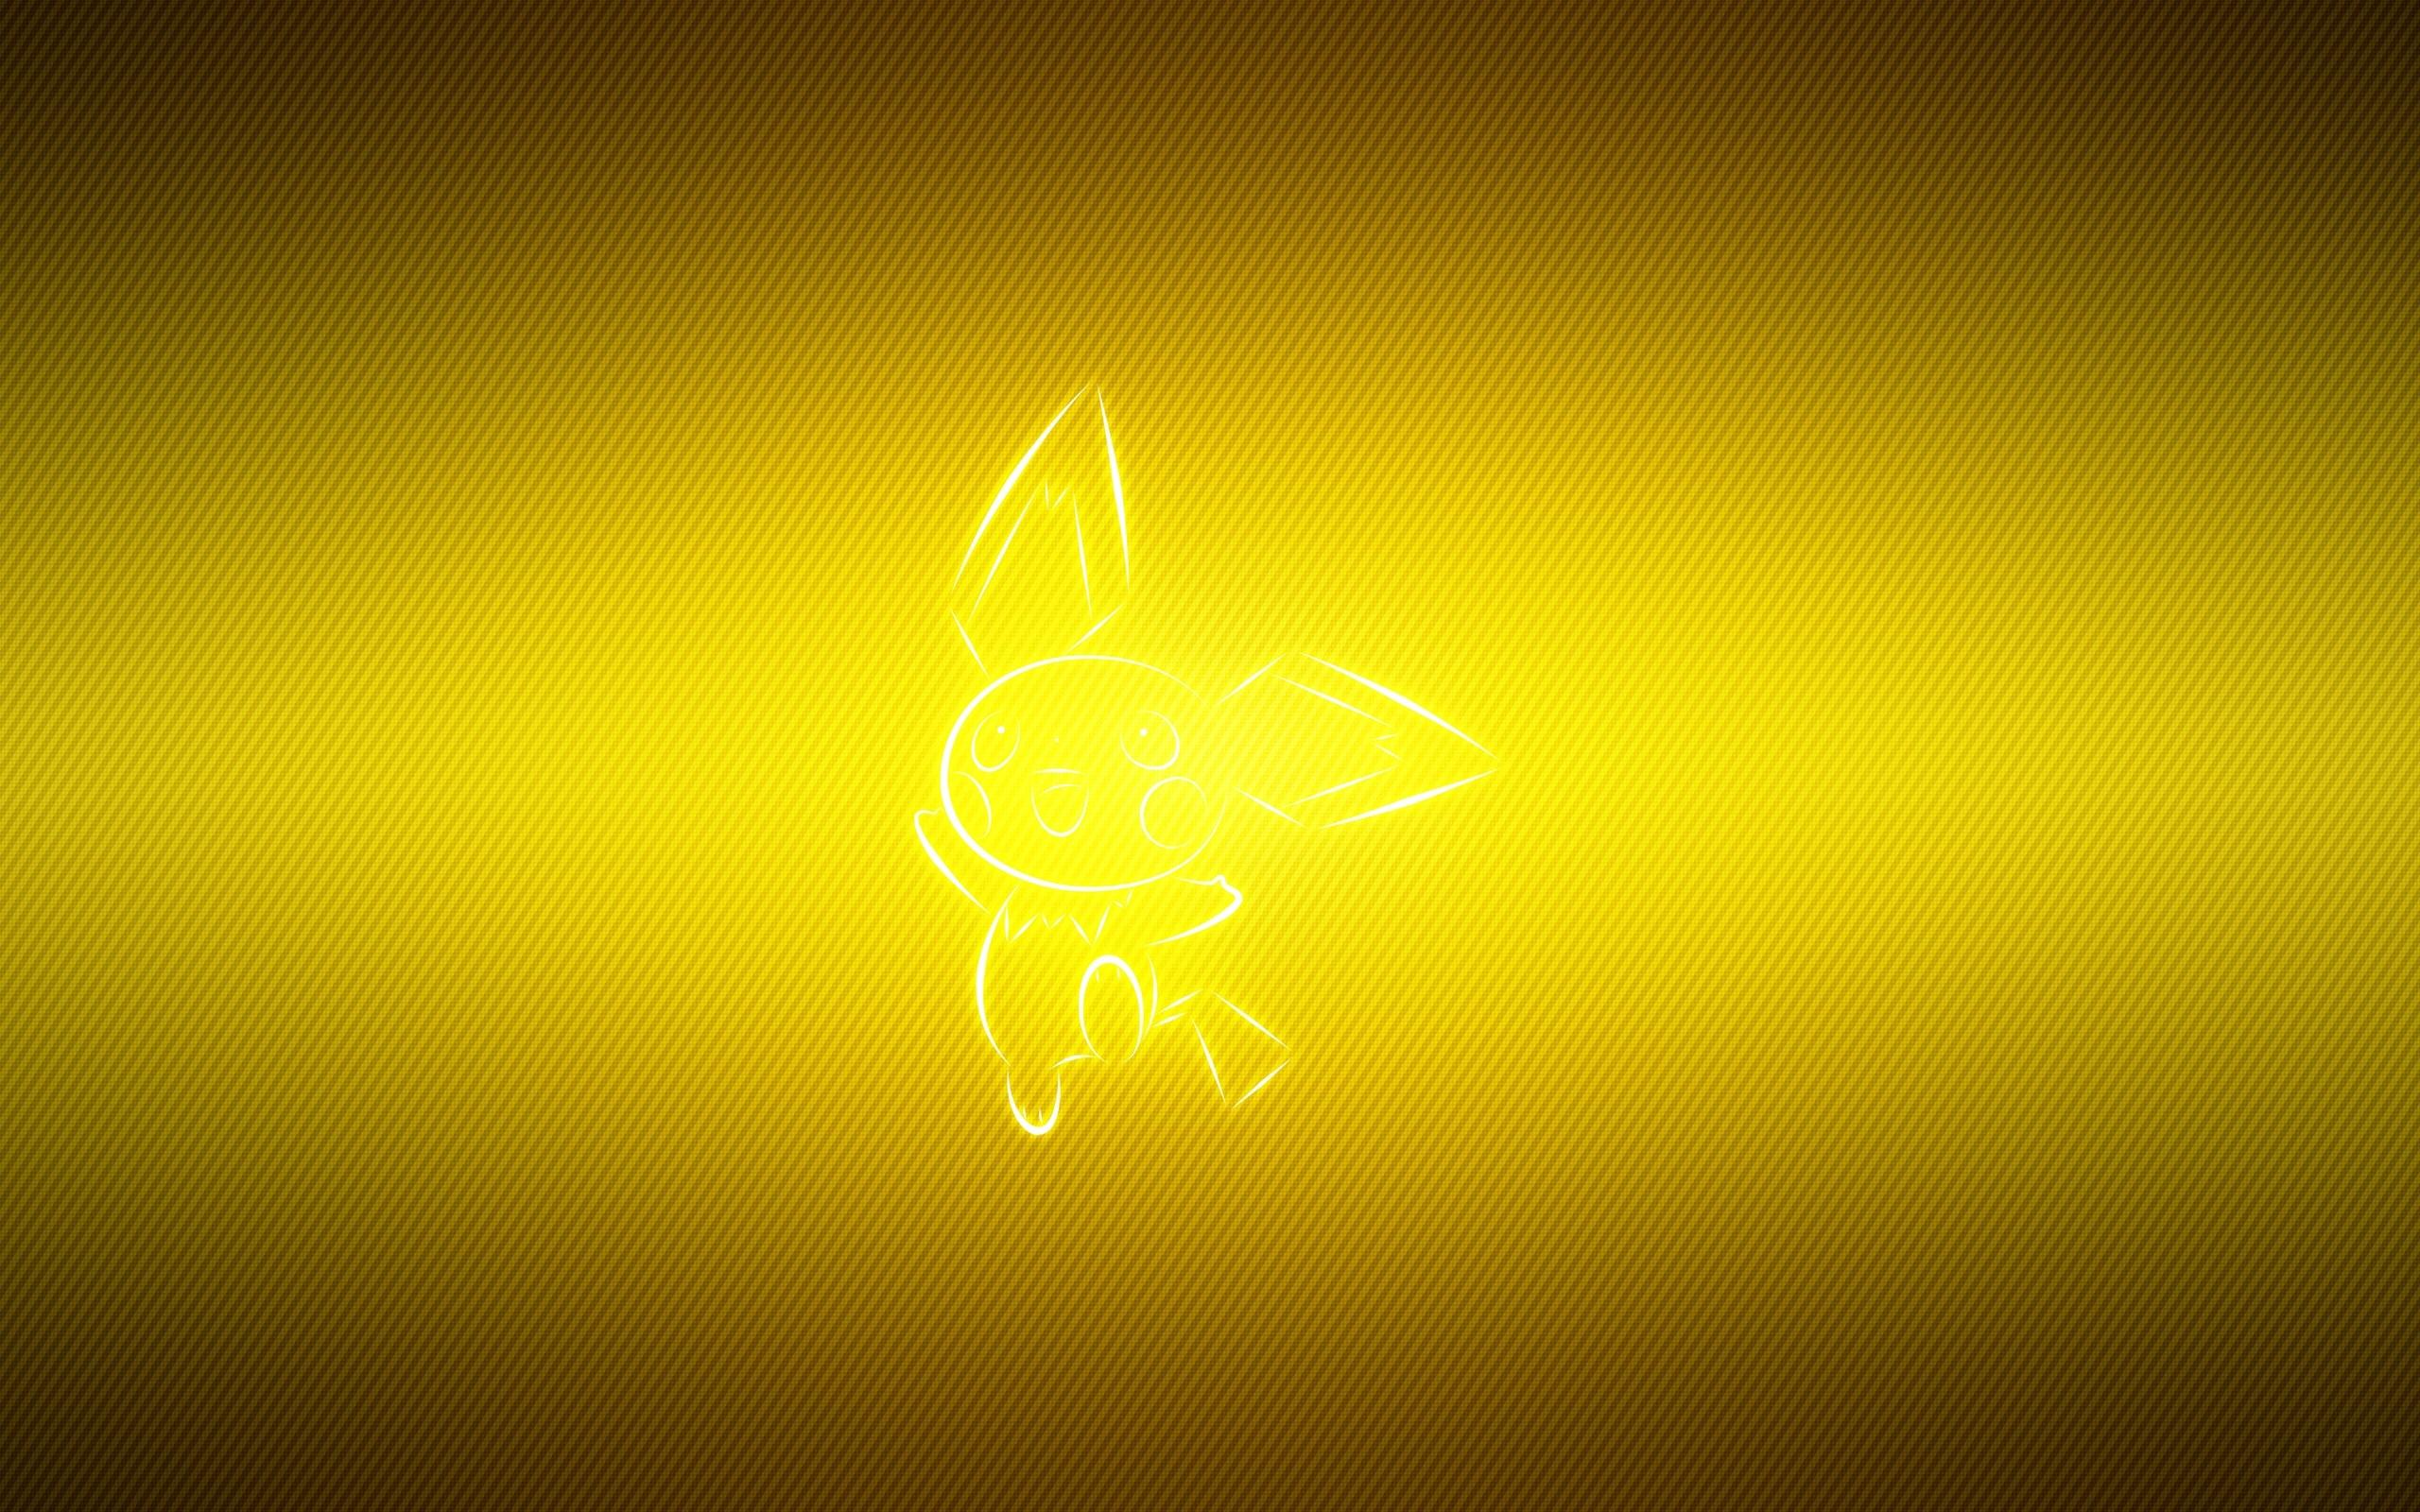 Pokemon Yellow Pichu   Stock Photos Images HD Wallpaper HD 2560x1600